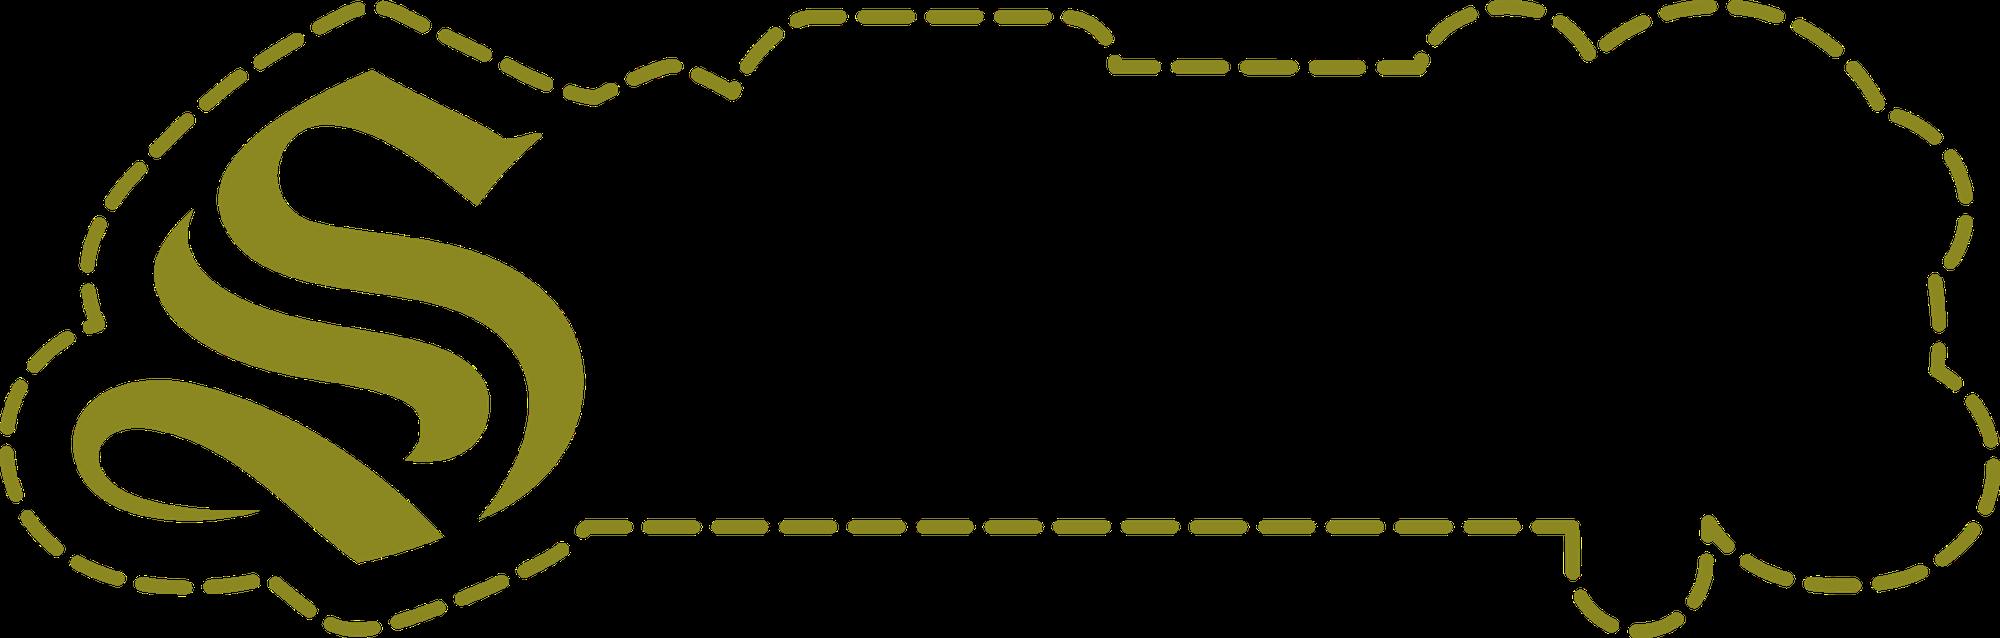 Logodesign als Reduktion